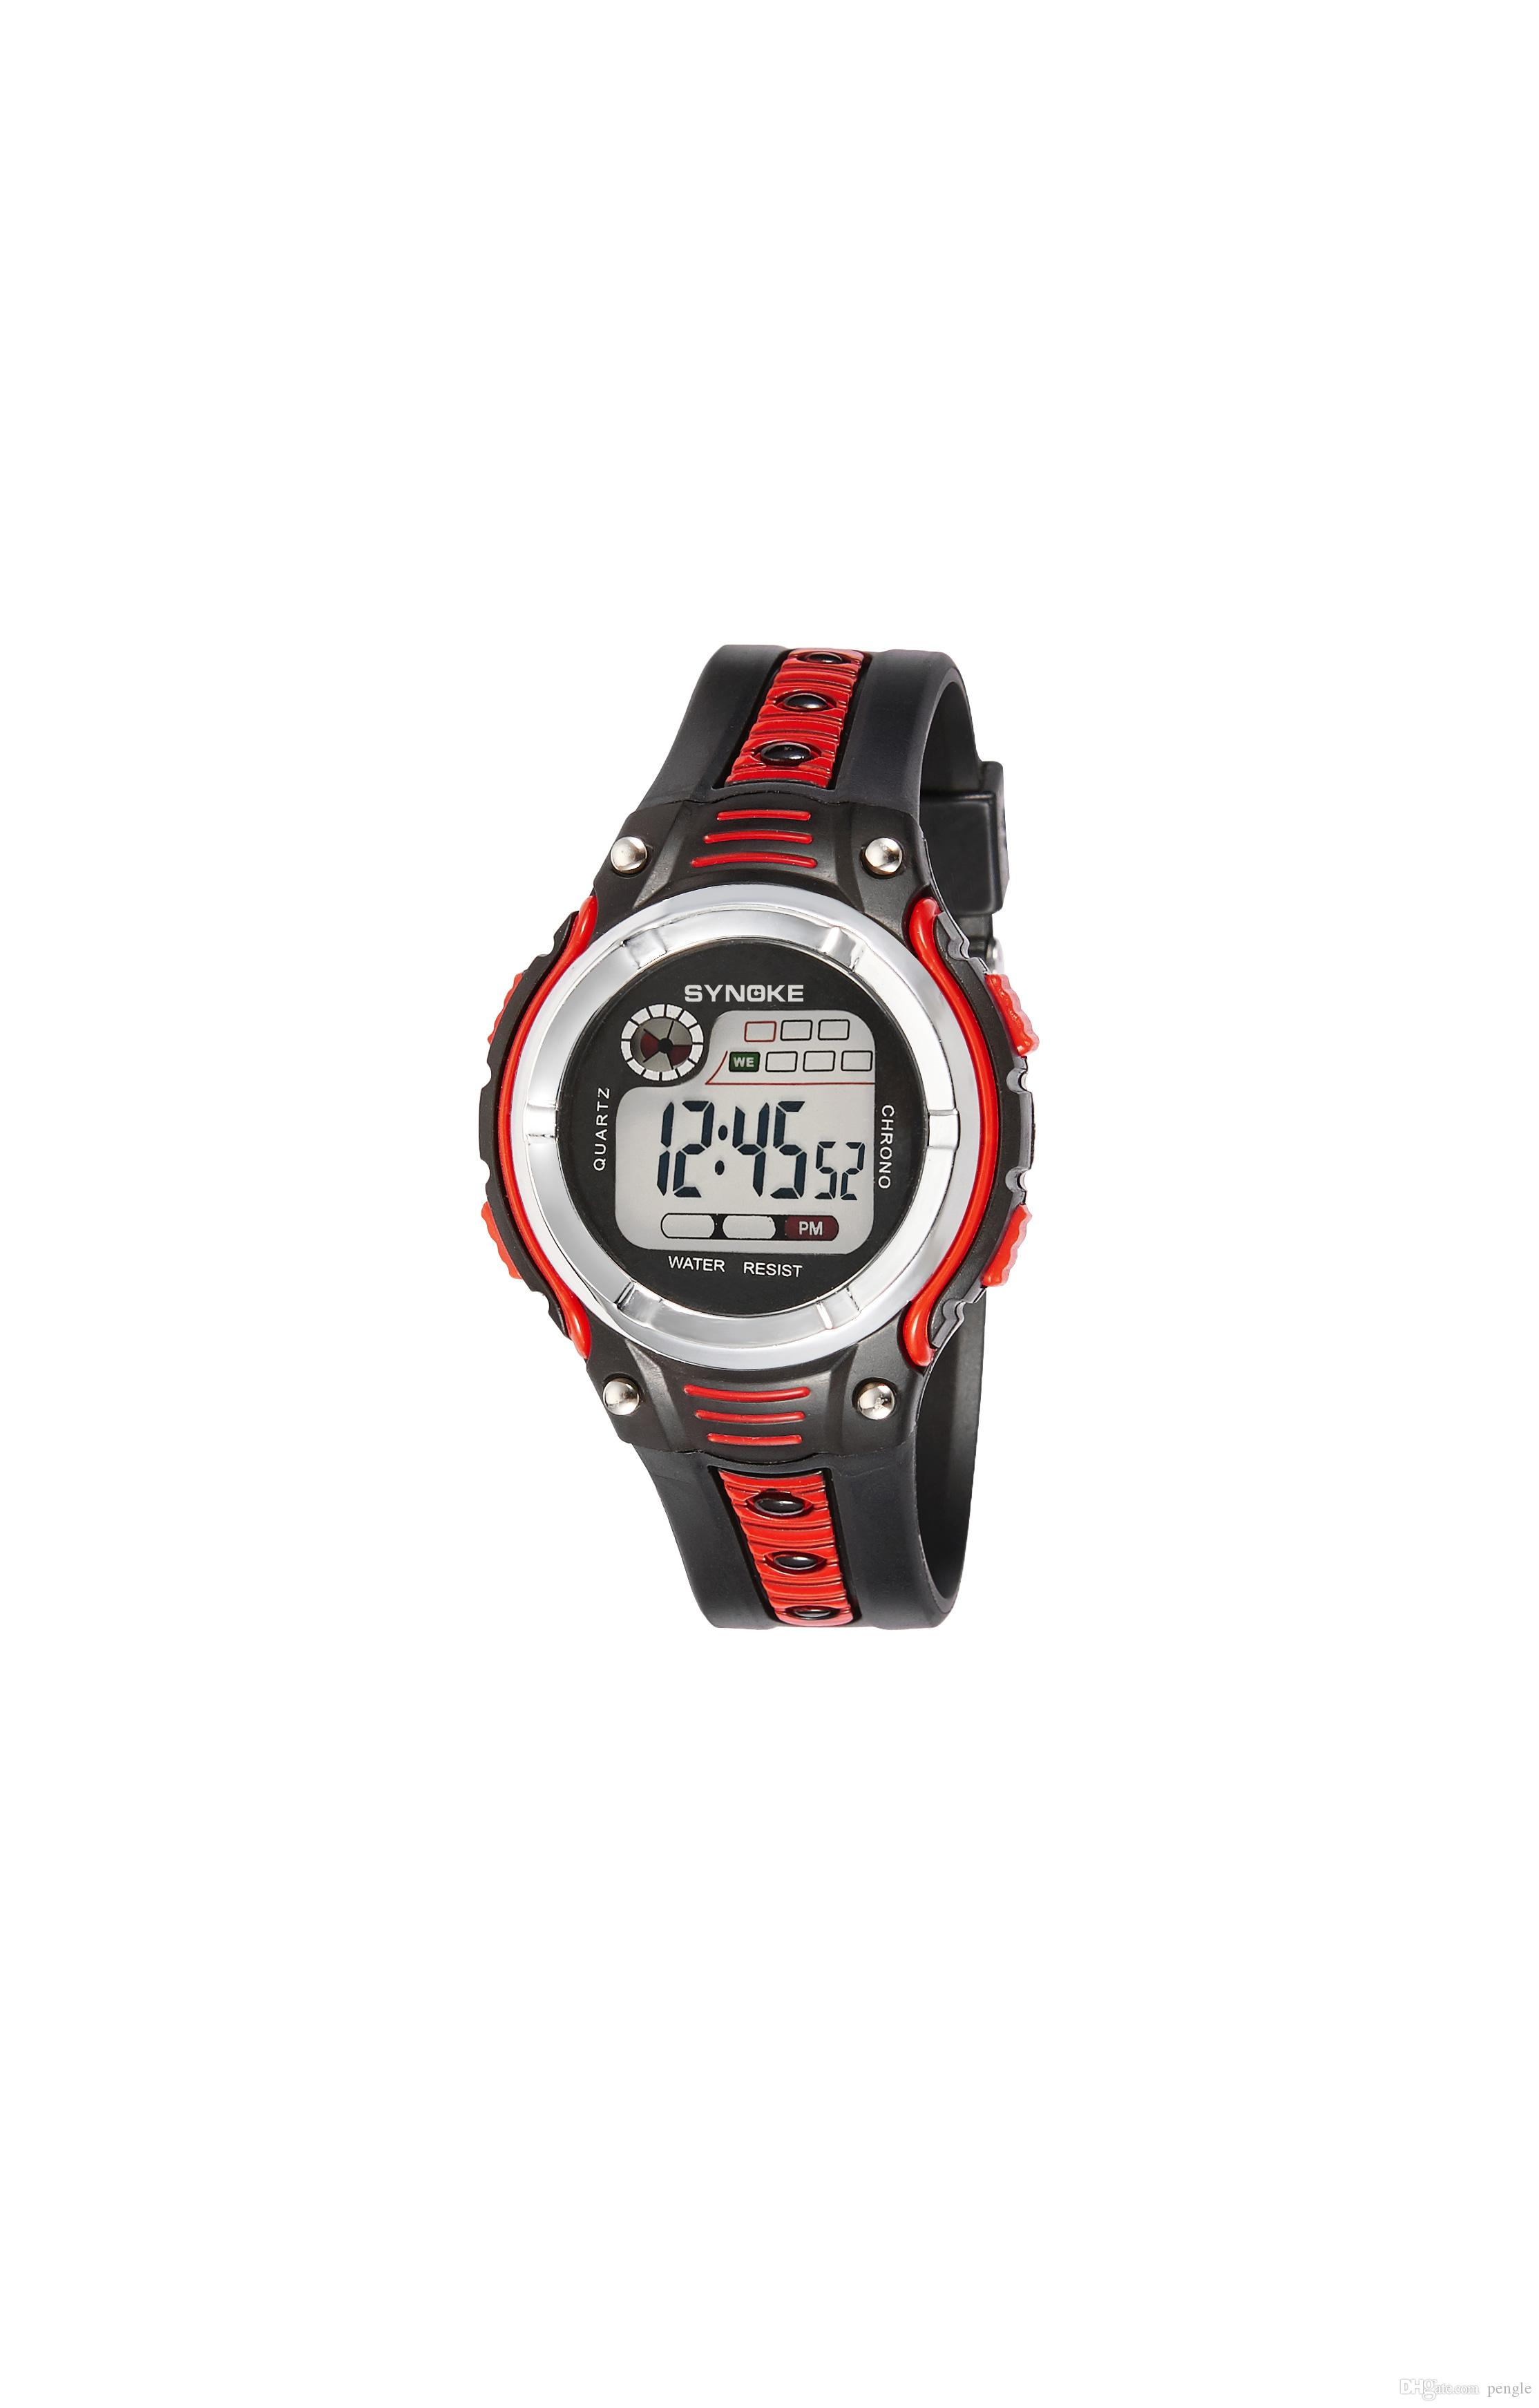 New Fashion Digital Watch 30m Waterproof Watch Colorful Luminous PU Wrist Watch Dual Colors Strap Drop Free Shipping